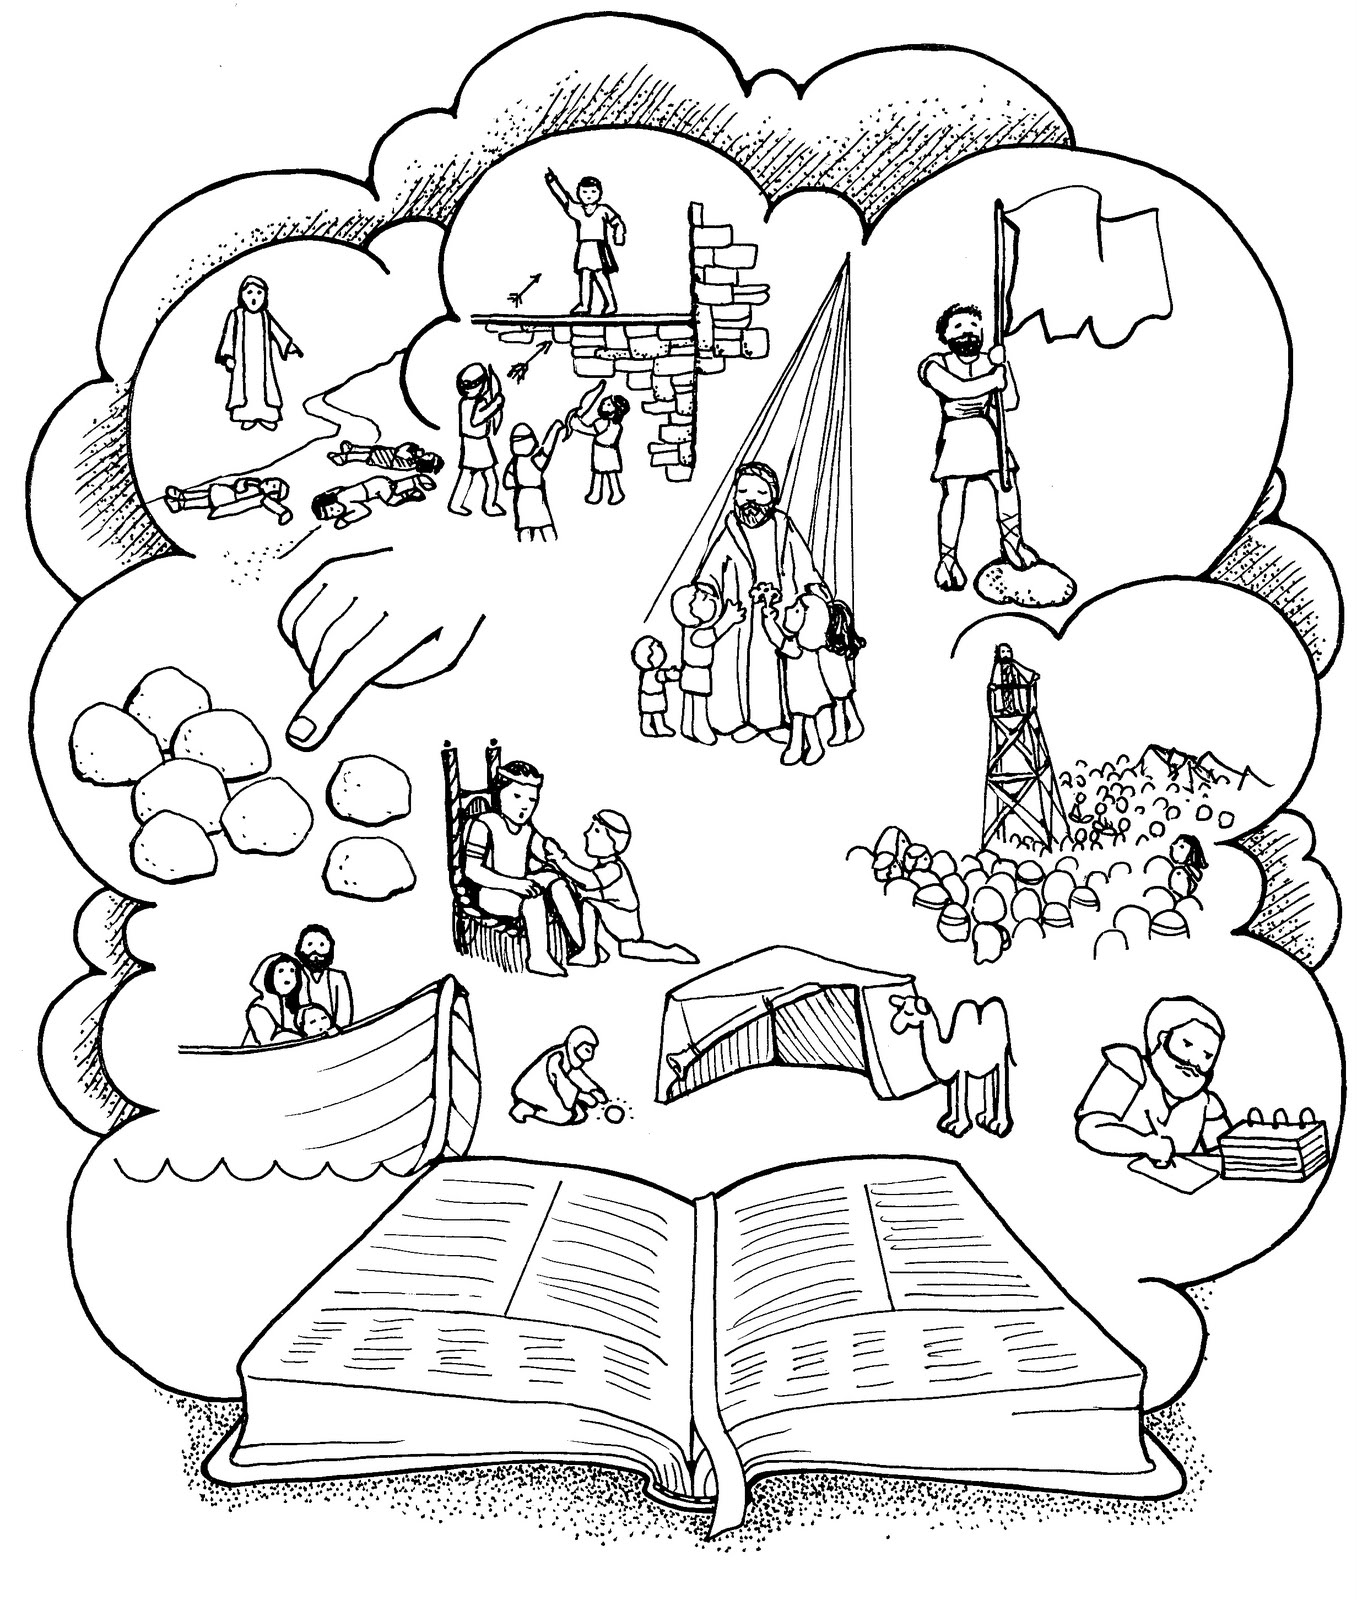 Book of mormon lds clipart black and white picture freeuse stock Mormon Scripture Cliparts - Cliparts Zone picture freeuse stock